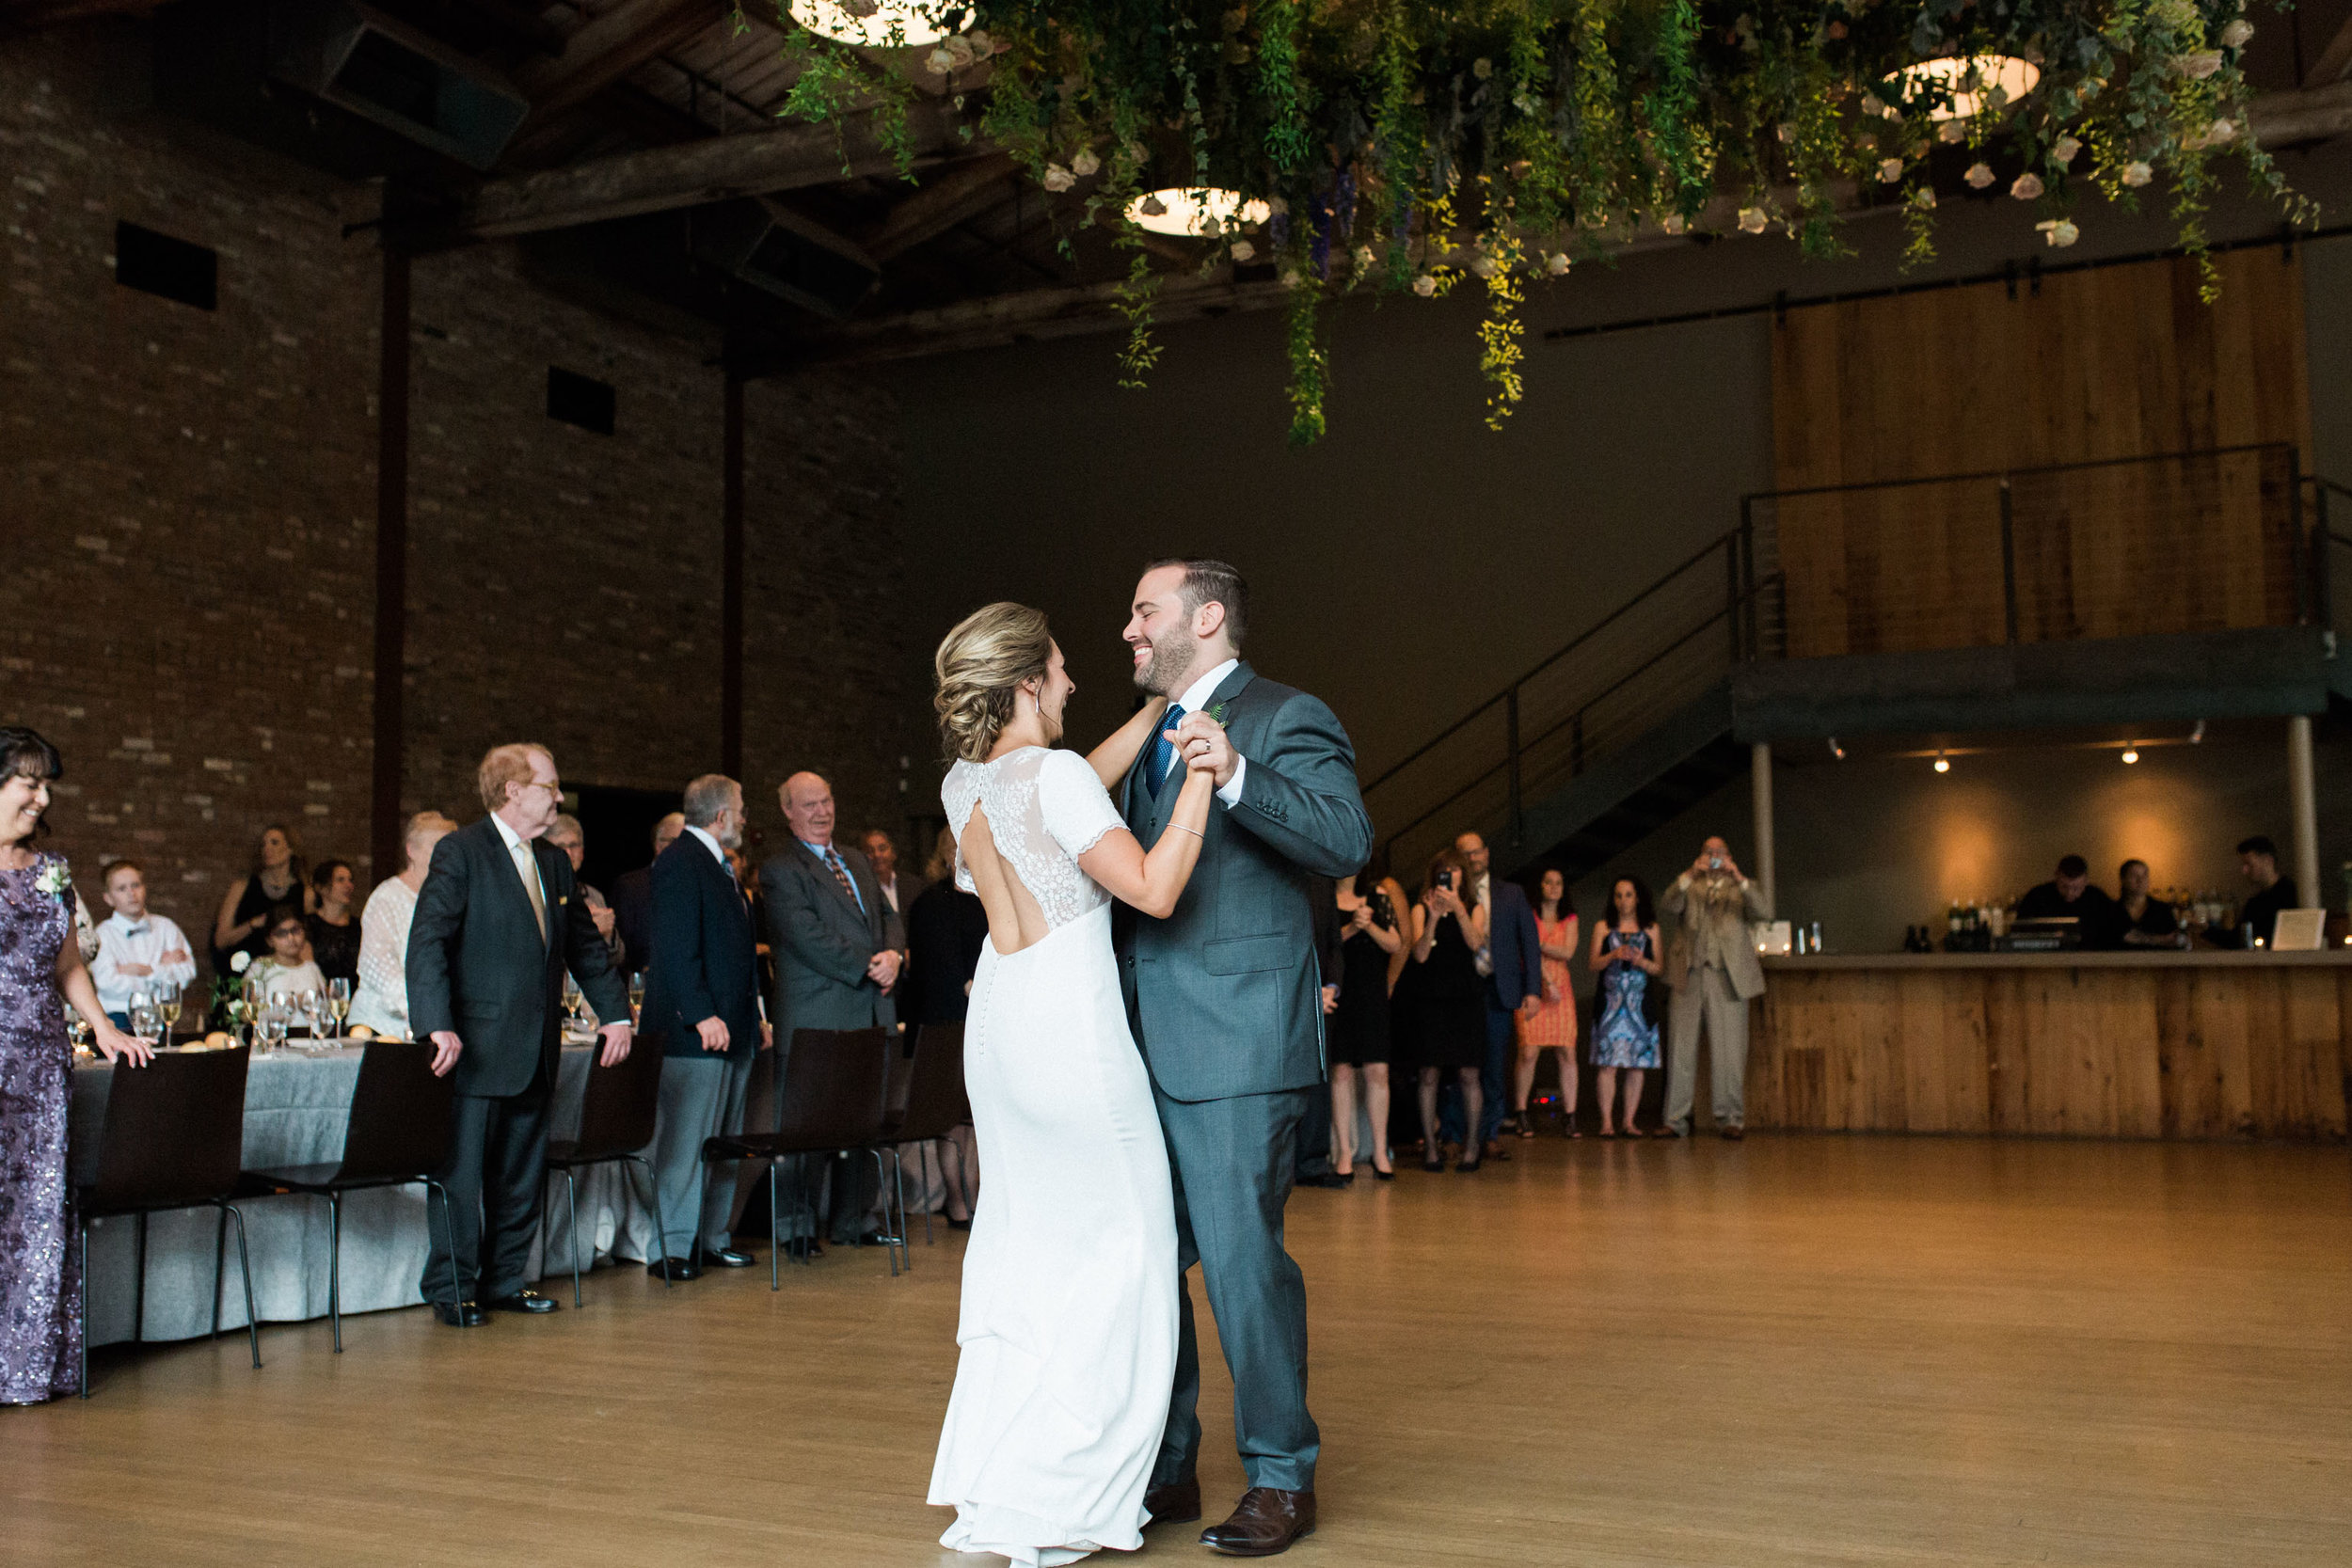 HiloandGinger-Brian+Dina_Weddingday_SneakPeek-49.jpg